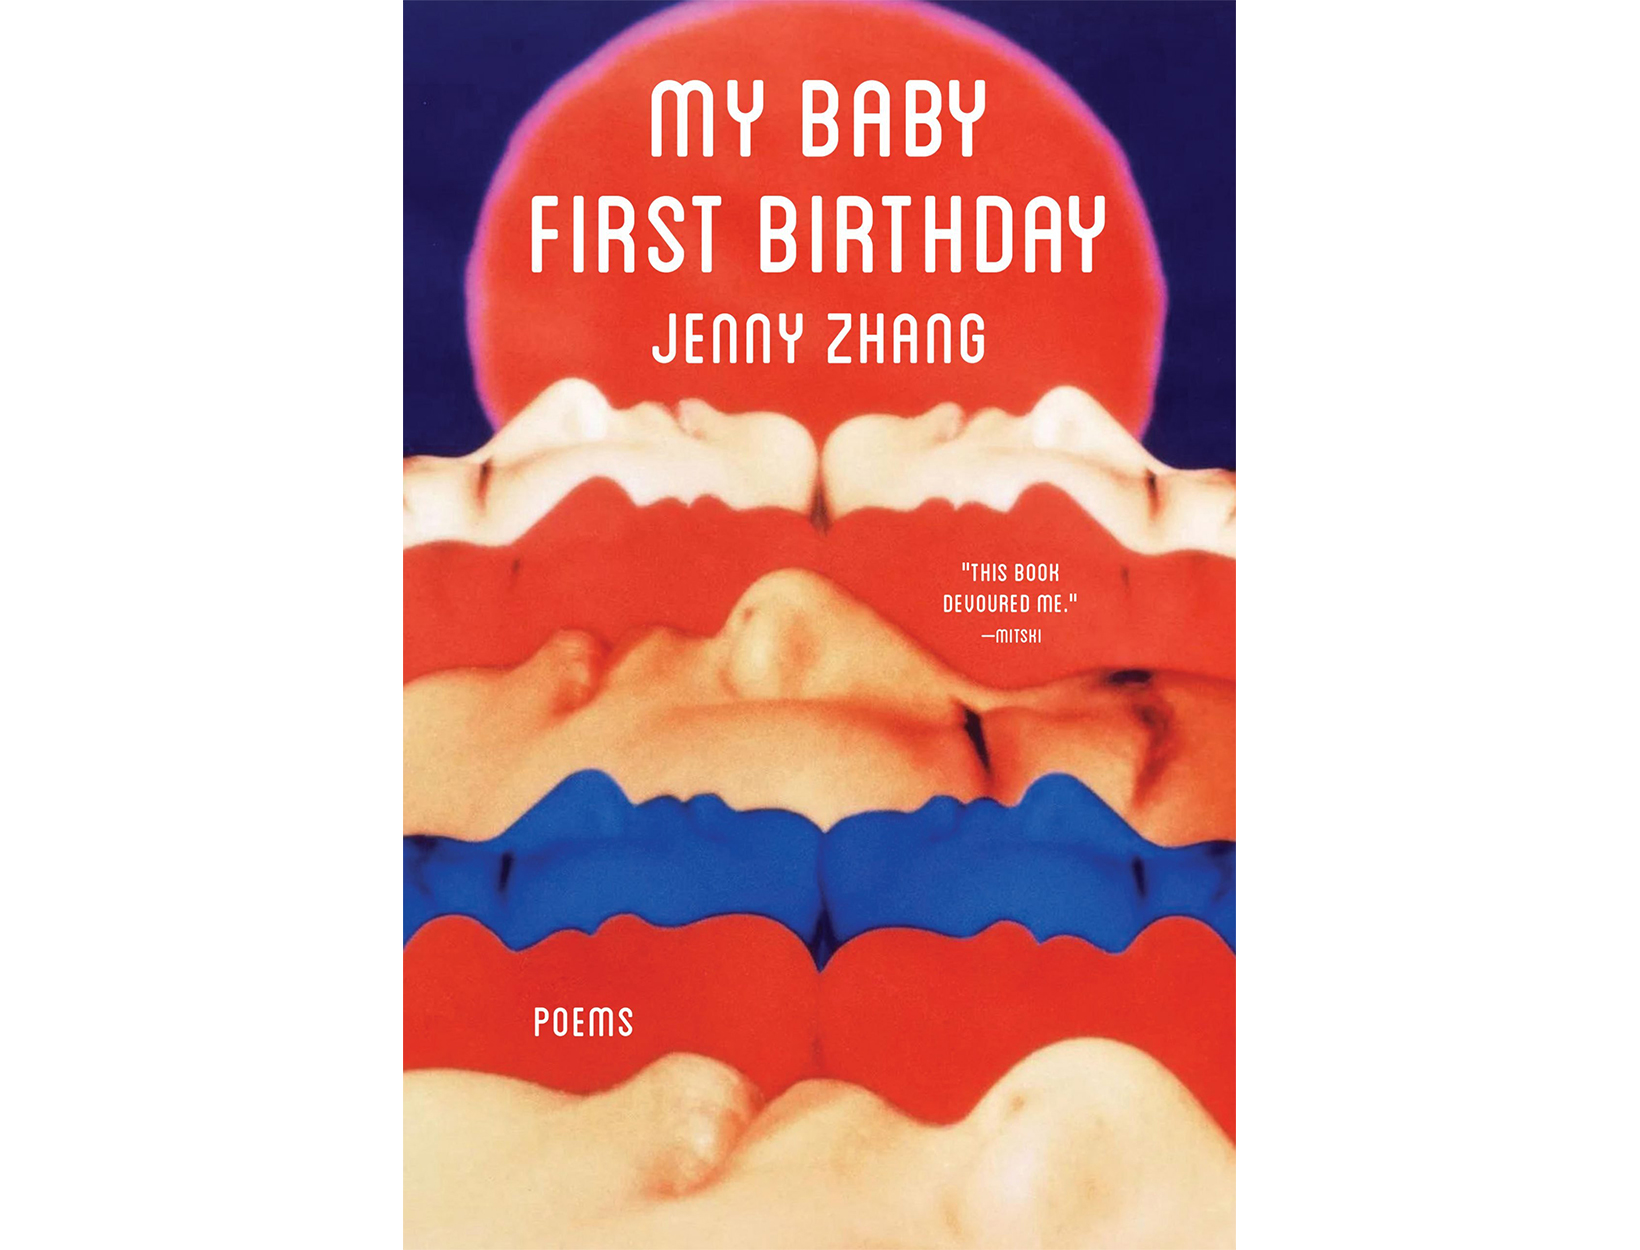 <em>My Baby First Birthday</em> by Jenny Zhang